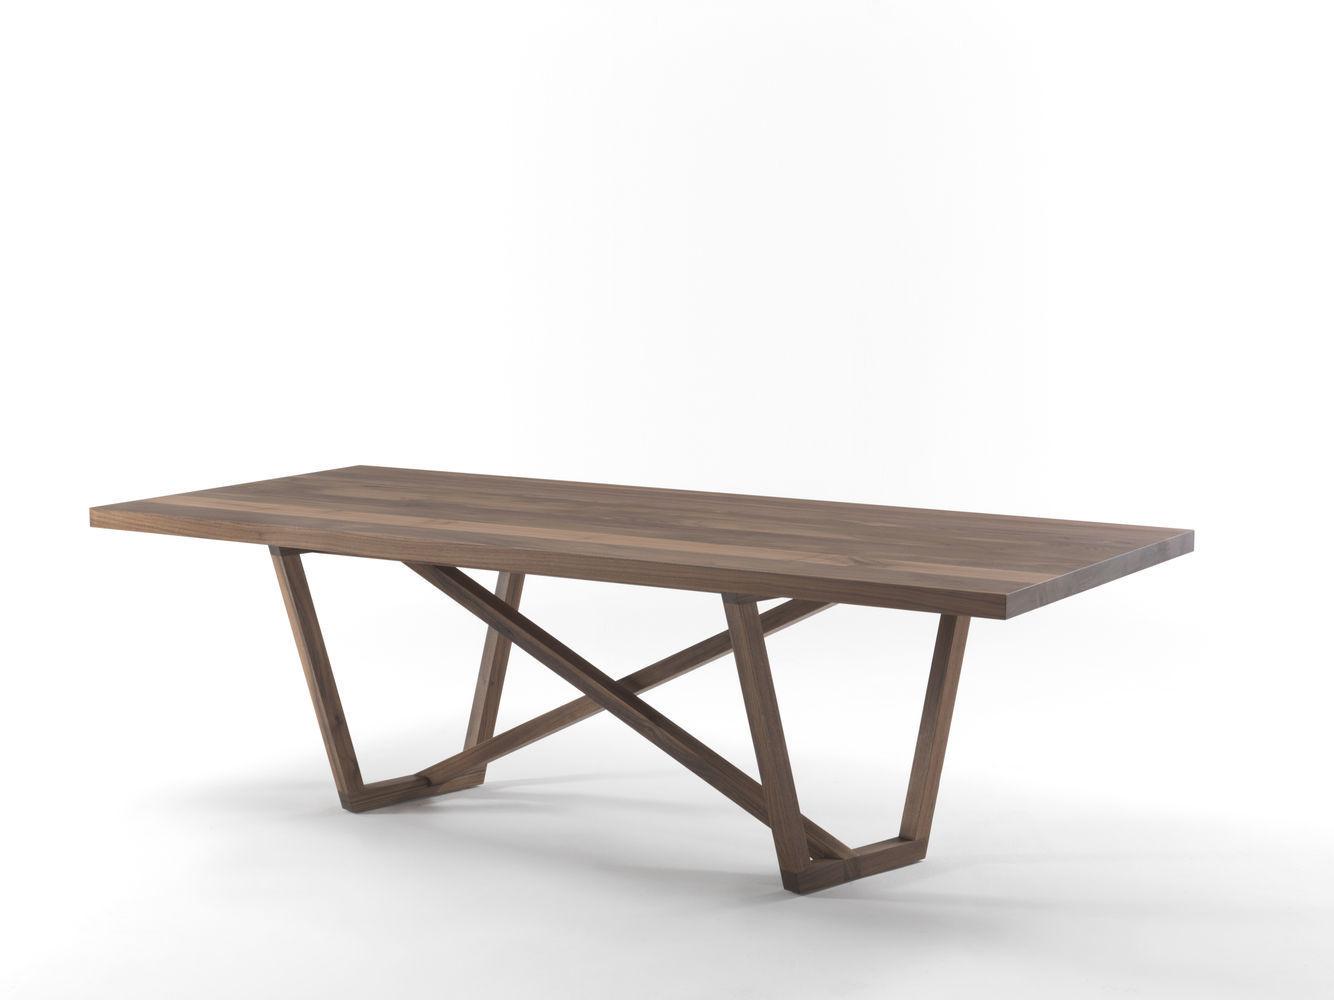 Moderner Tisch / Massivholz / Rechteckig TRAVERSO By Giovanna Azzarello Riva  Industria Mobili ...